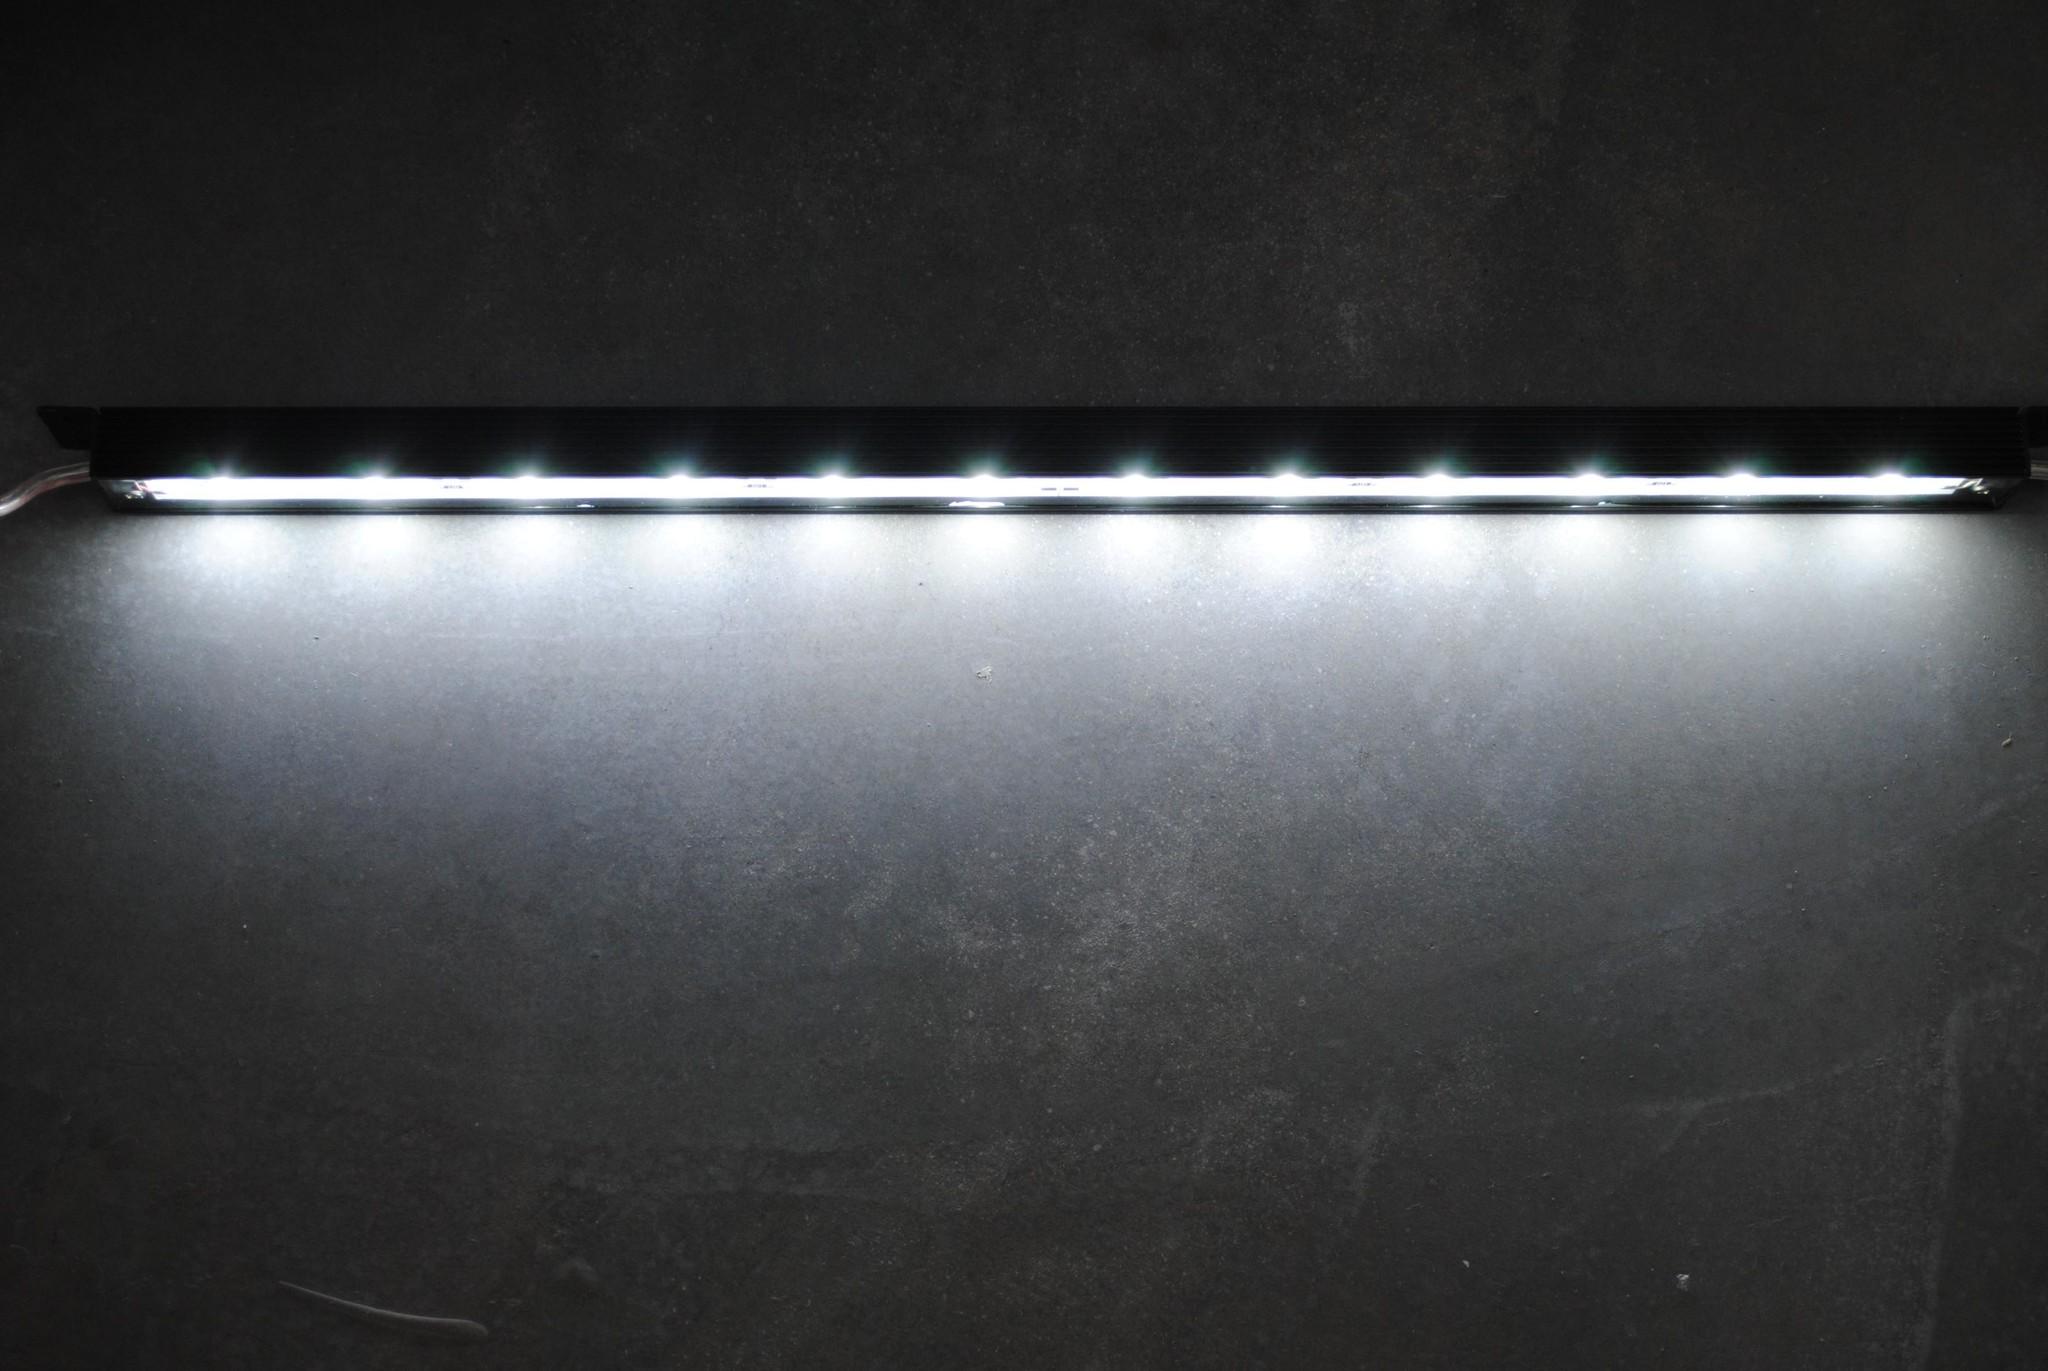 LEDBAR PRO 50 cm White IP68 Waterproof 12W 24V